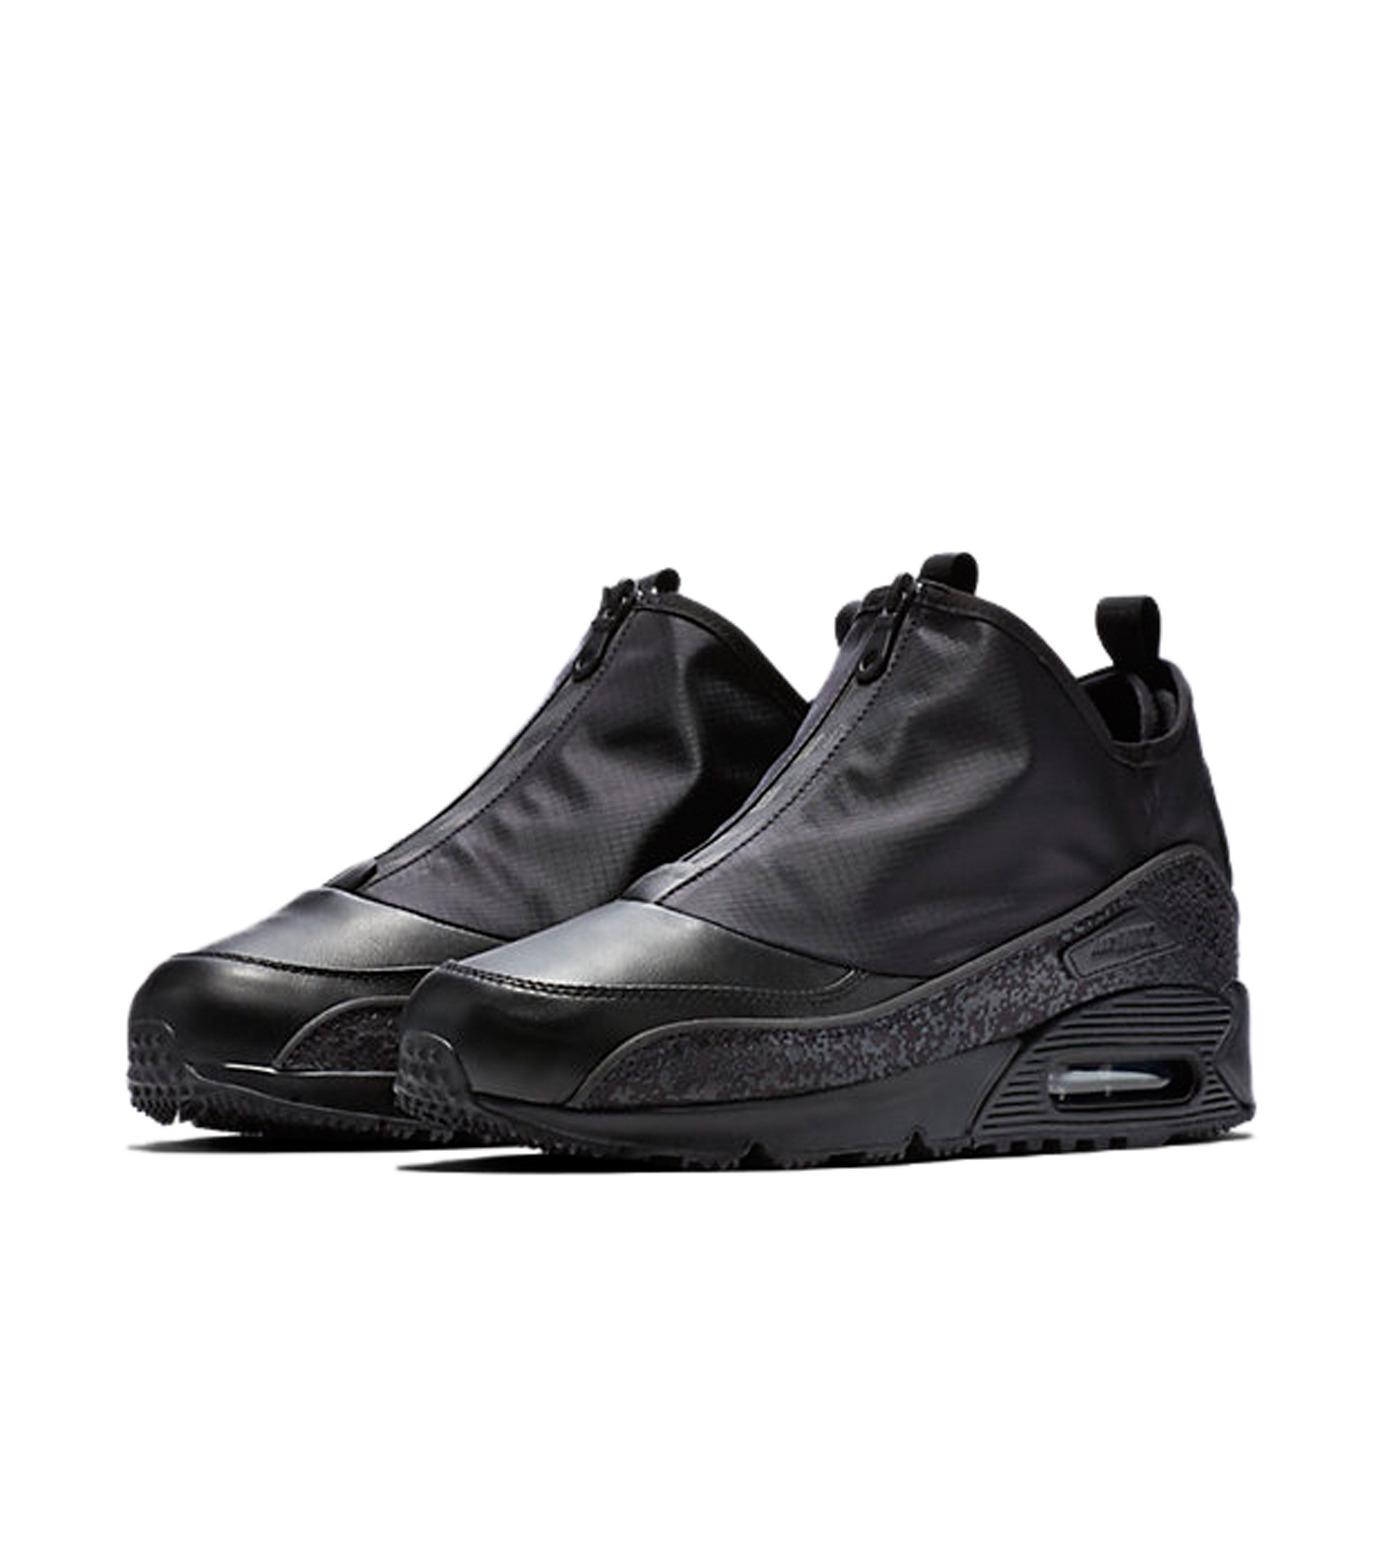 NIKE(ナイキ)のAIR MAX 90 UTILITY-BLACK(シューズ/shoes)-858956-001-13 拡大詳細画像3